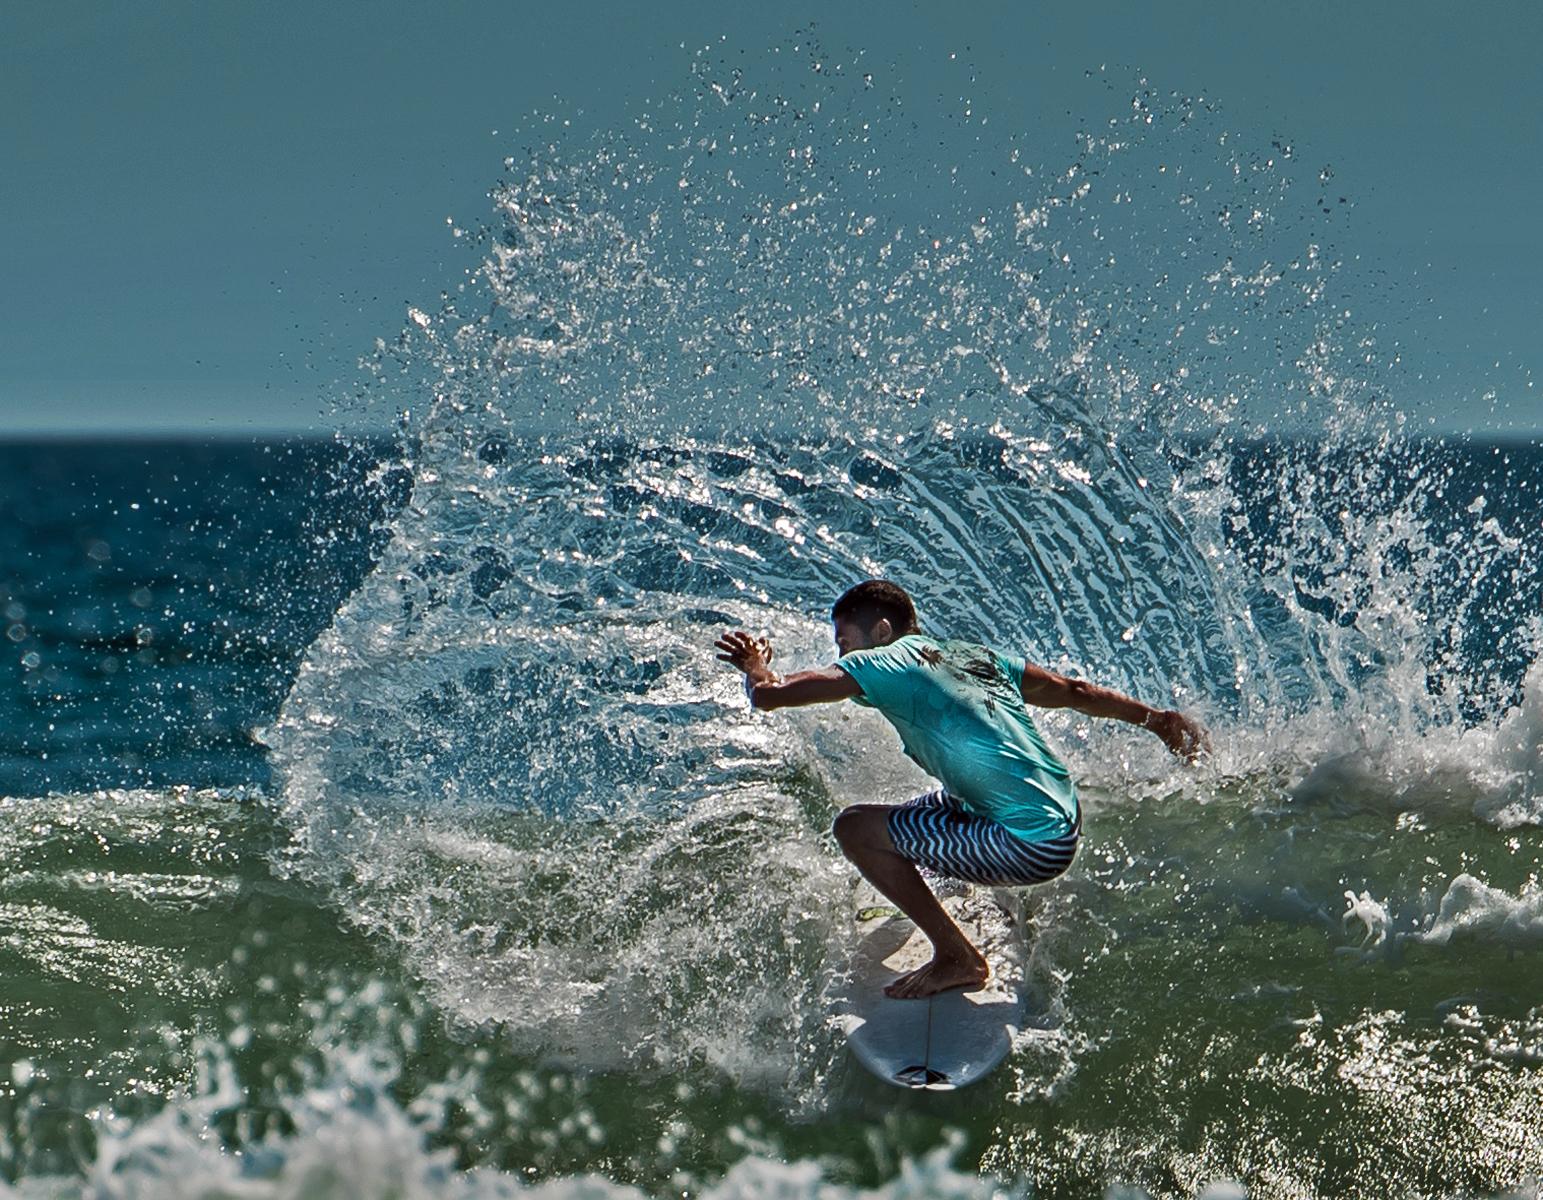 Members' Choice PDI Winner - Making a Splash, by Keith Greig